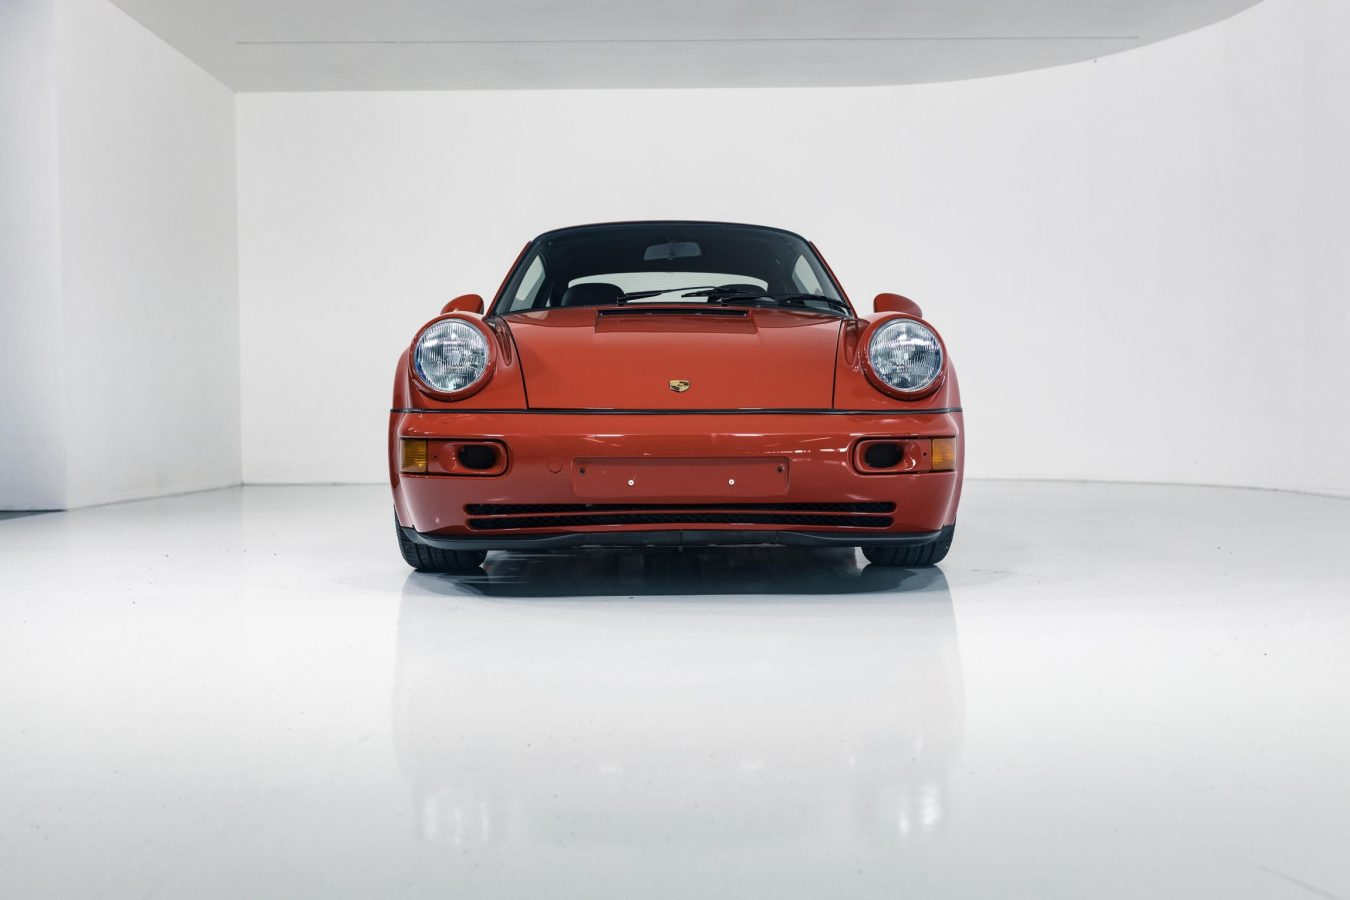 Porsche 911 Turbo S 15